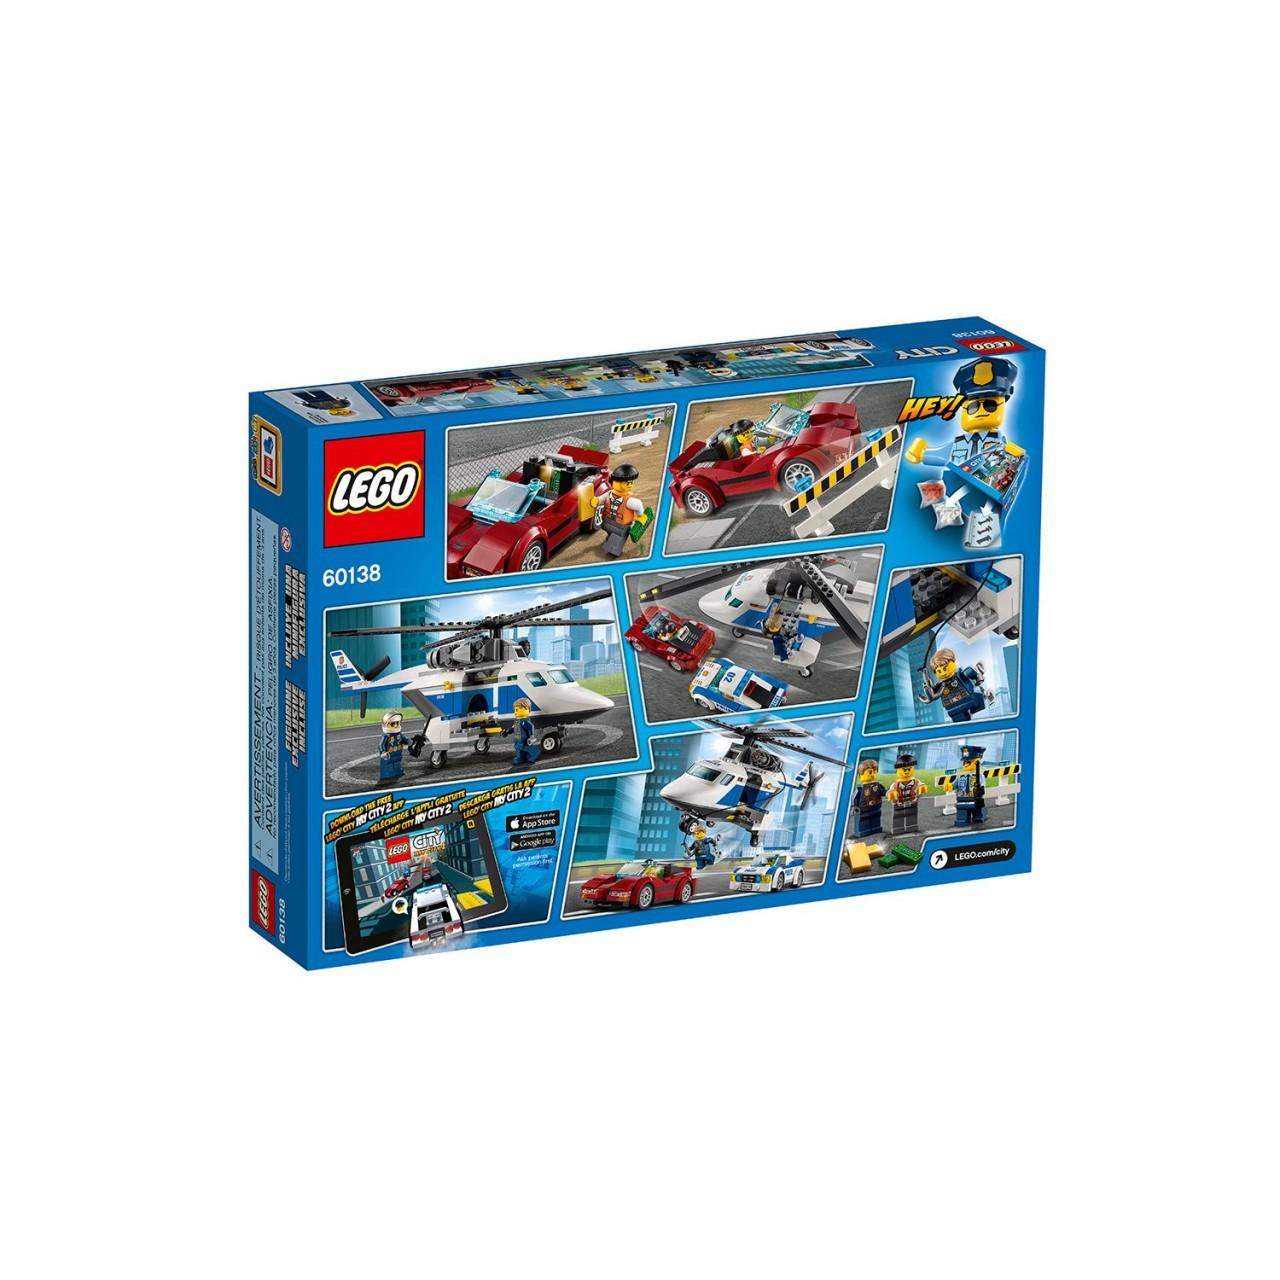 LEGO CITY 60138 Rasante Verfolgungsjagd